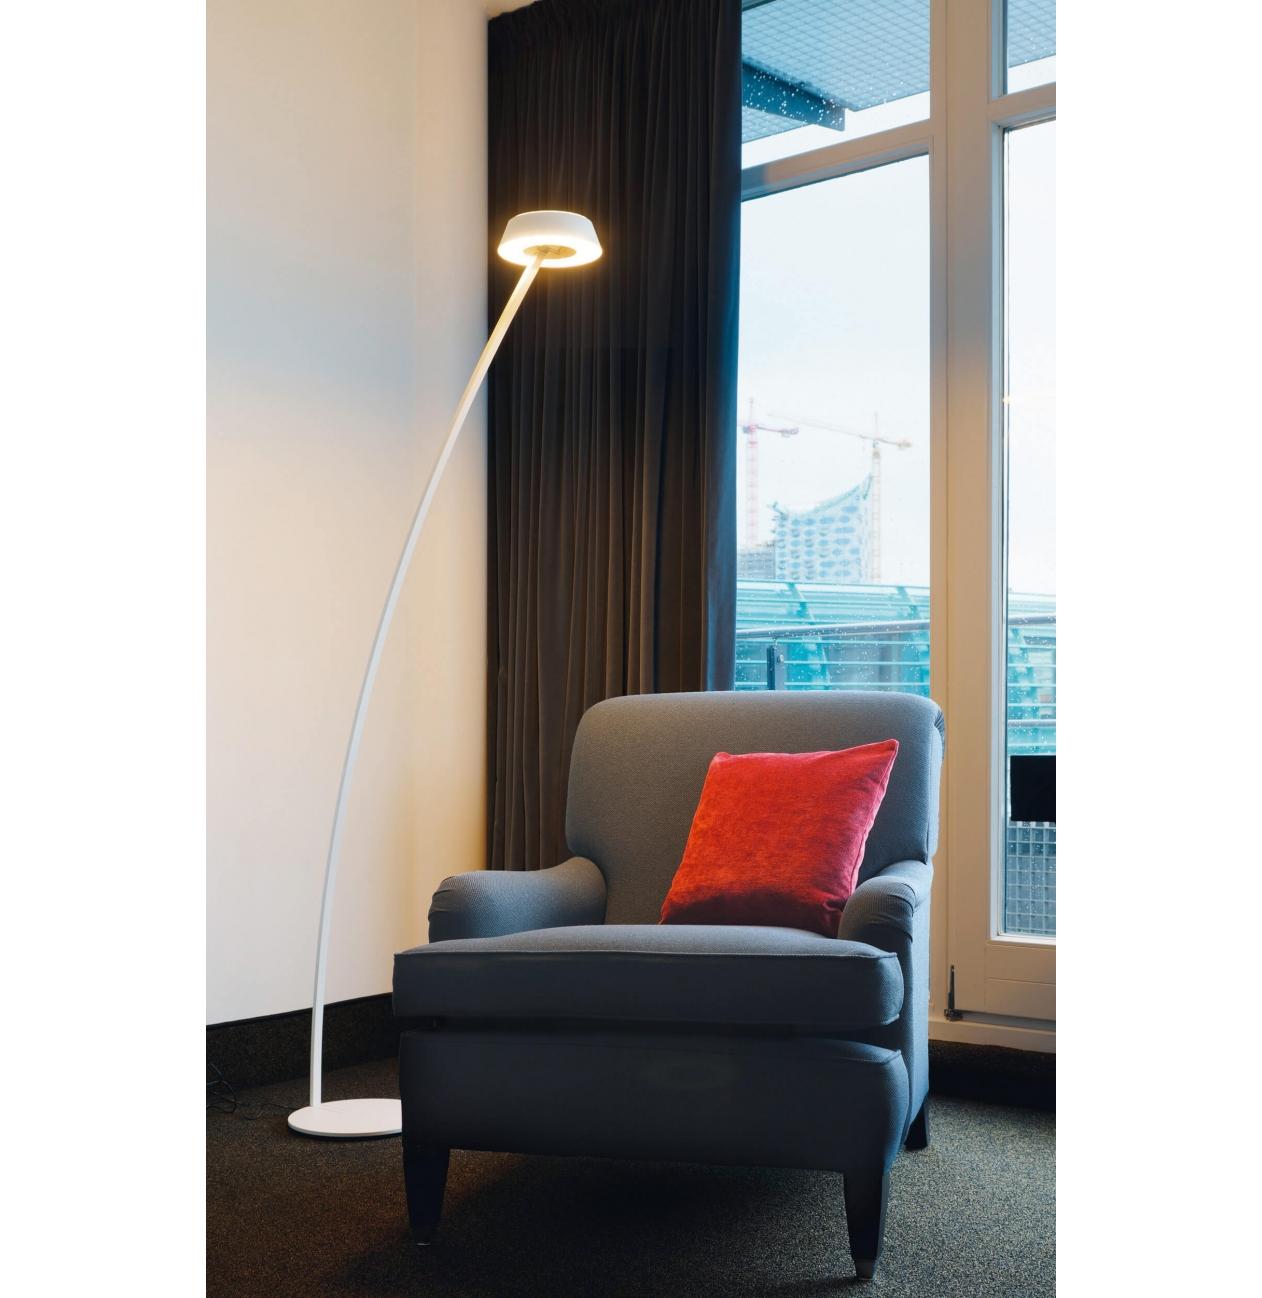 Oligo Lampen - Shop Oligo bij Versteeg Lichtstudio